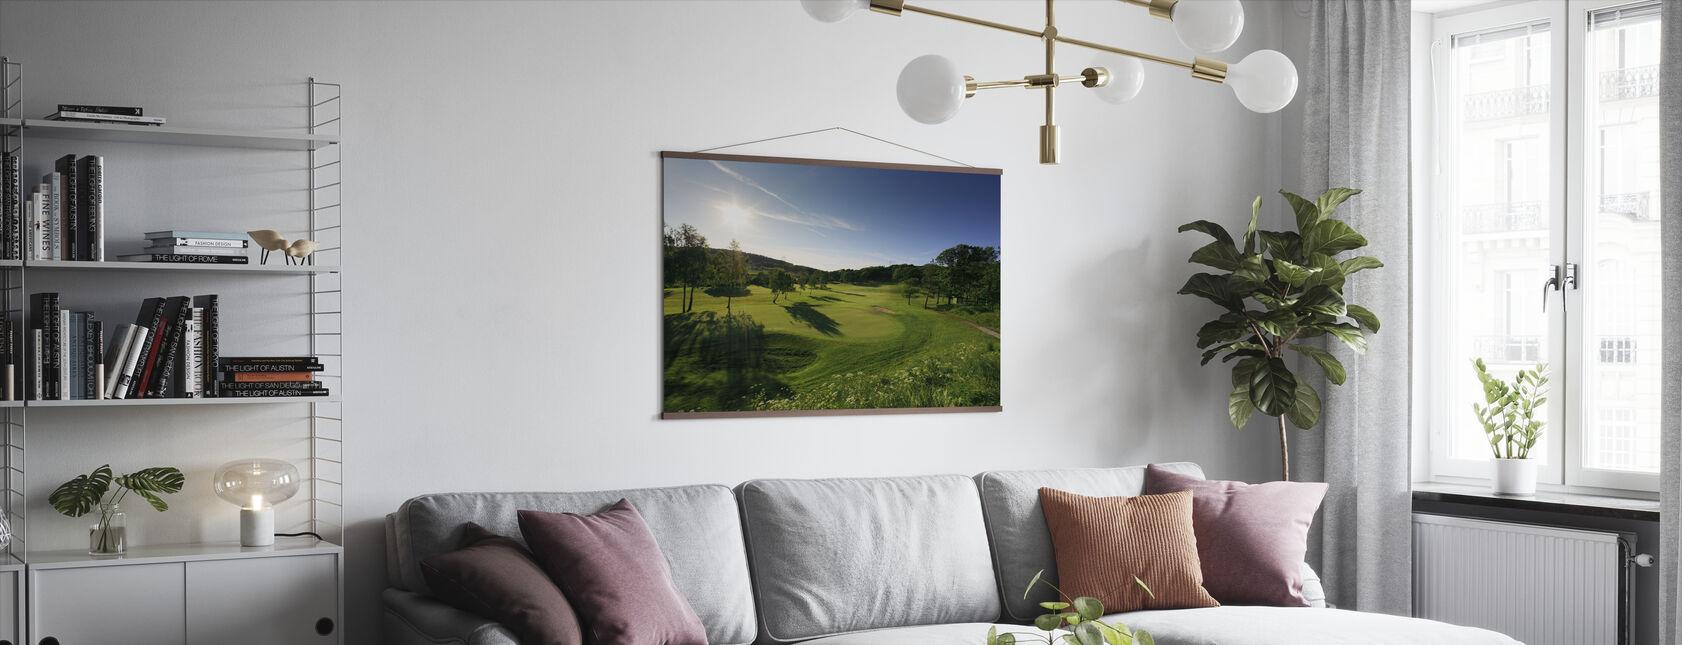 Golfbaan in Göteborg, Zweden - Poster - Woonkamer